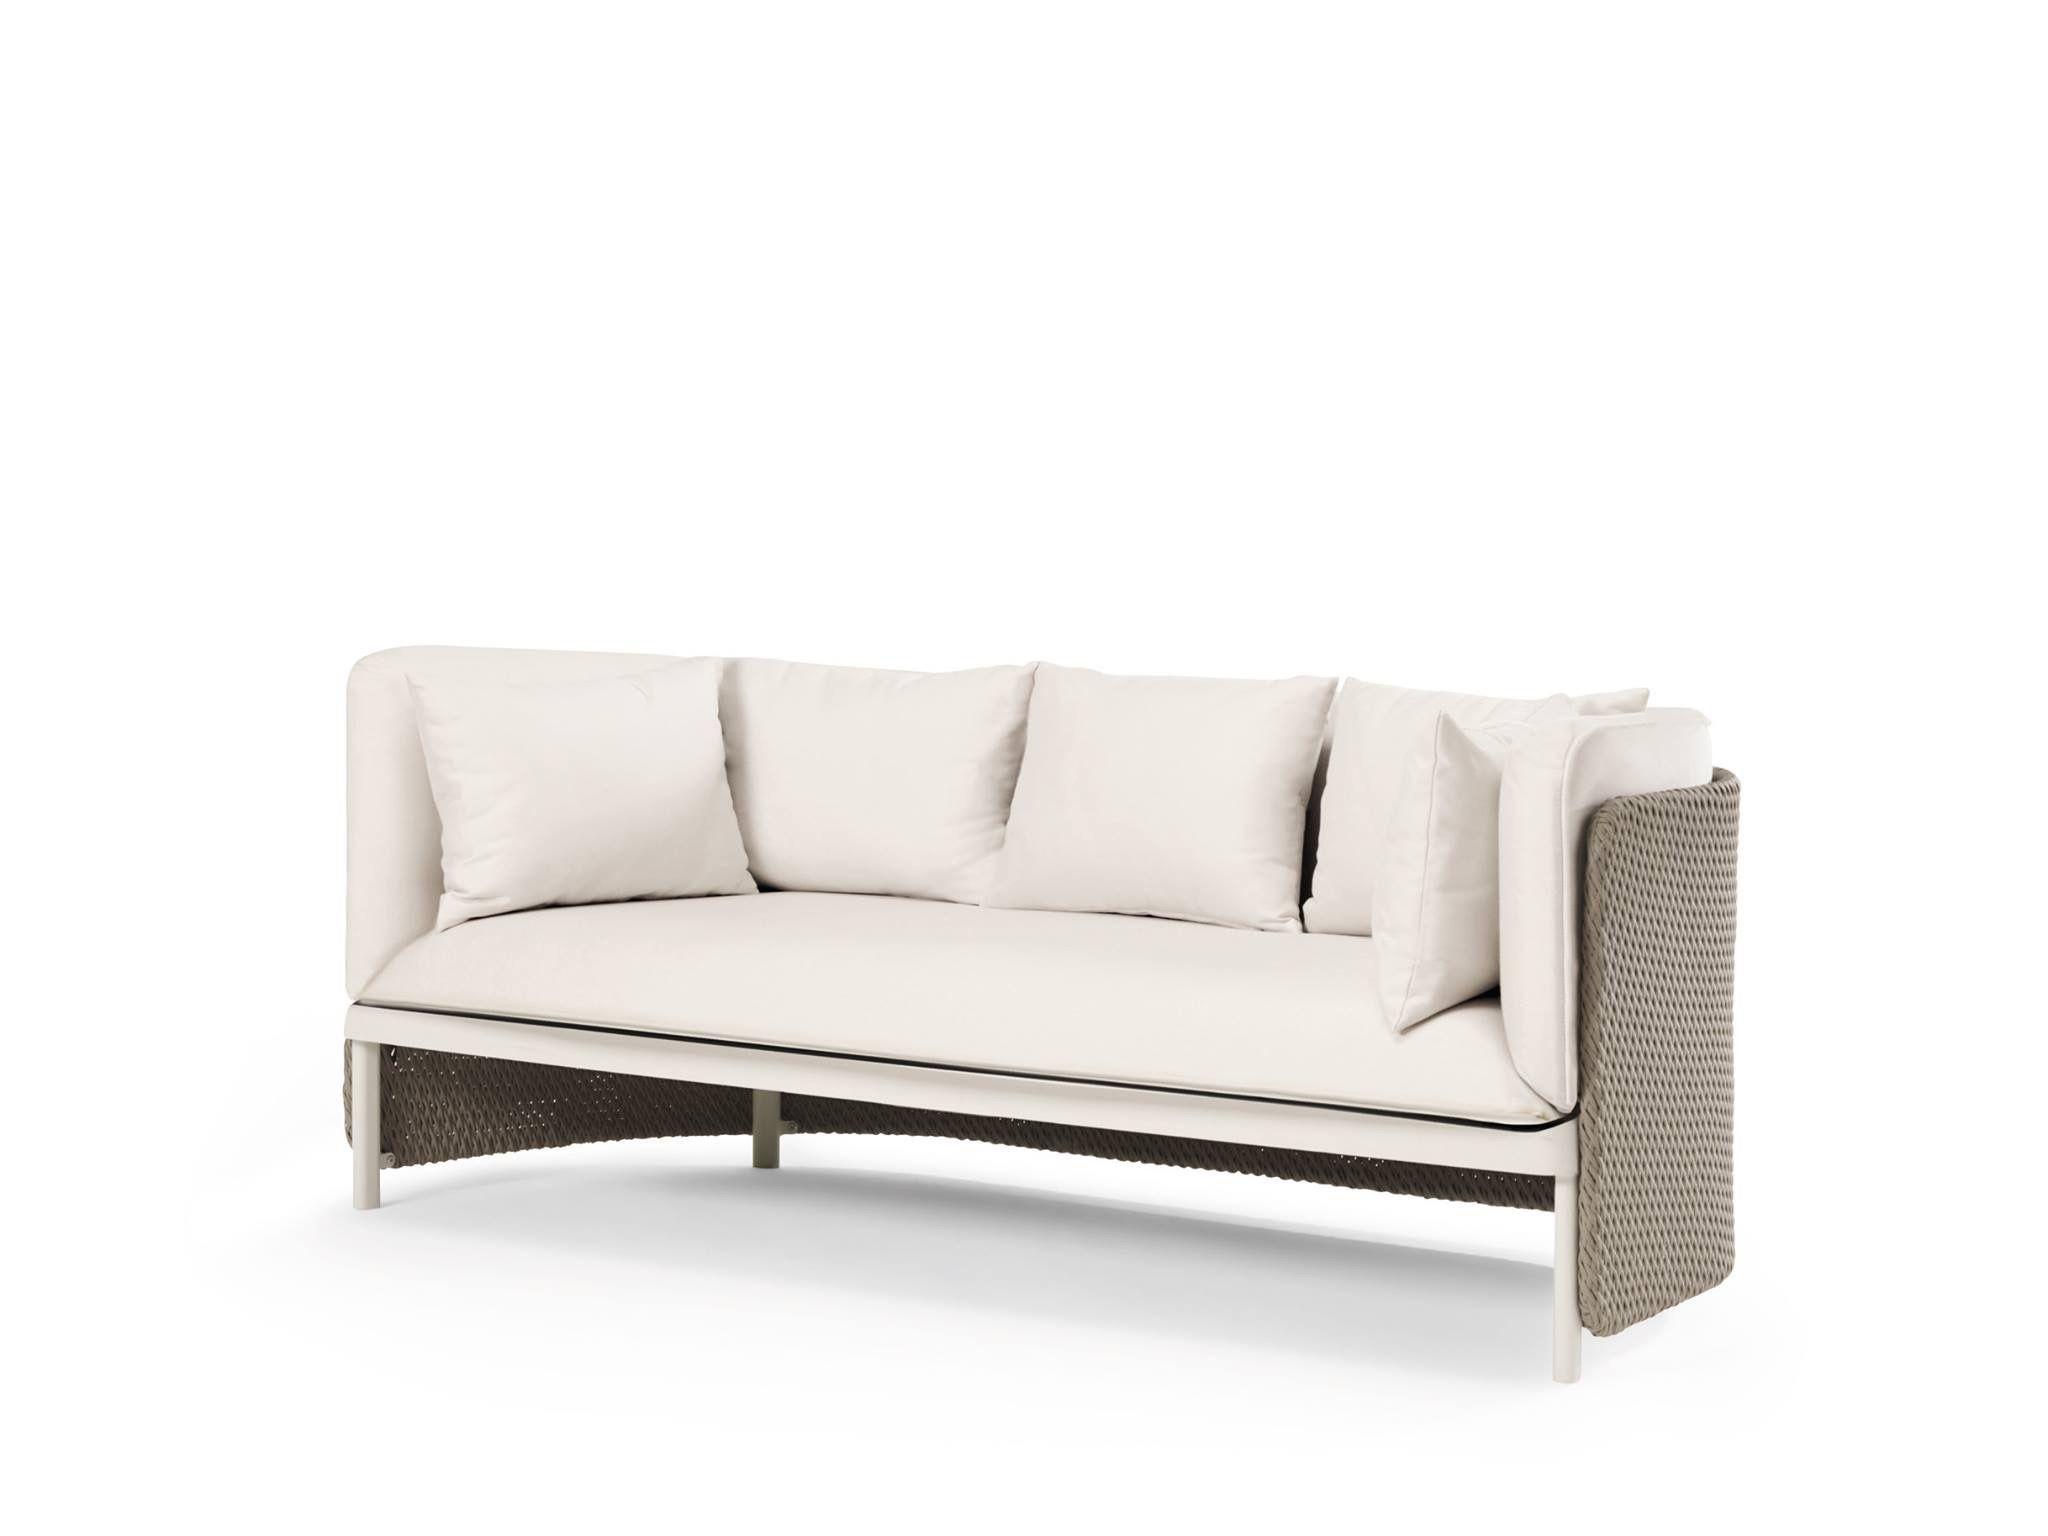 Pin by wei on Furniture | Outdoor | Garden sofa, Sofa ...